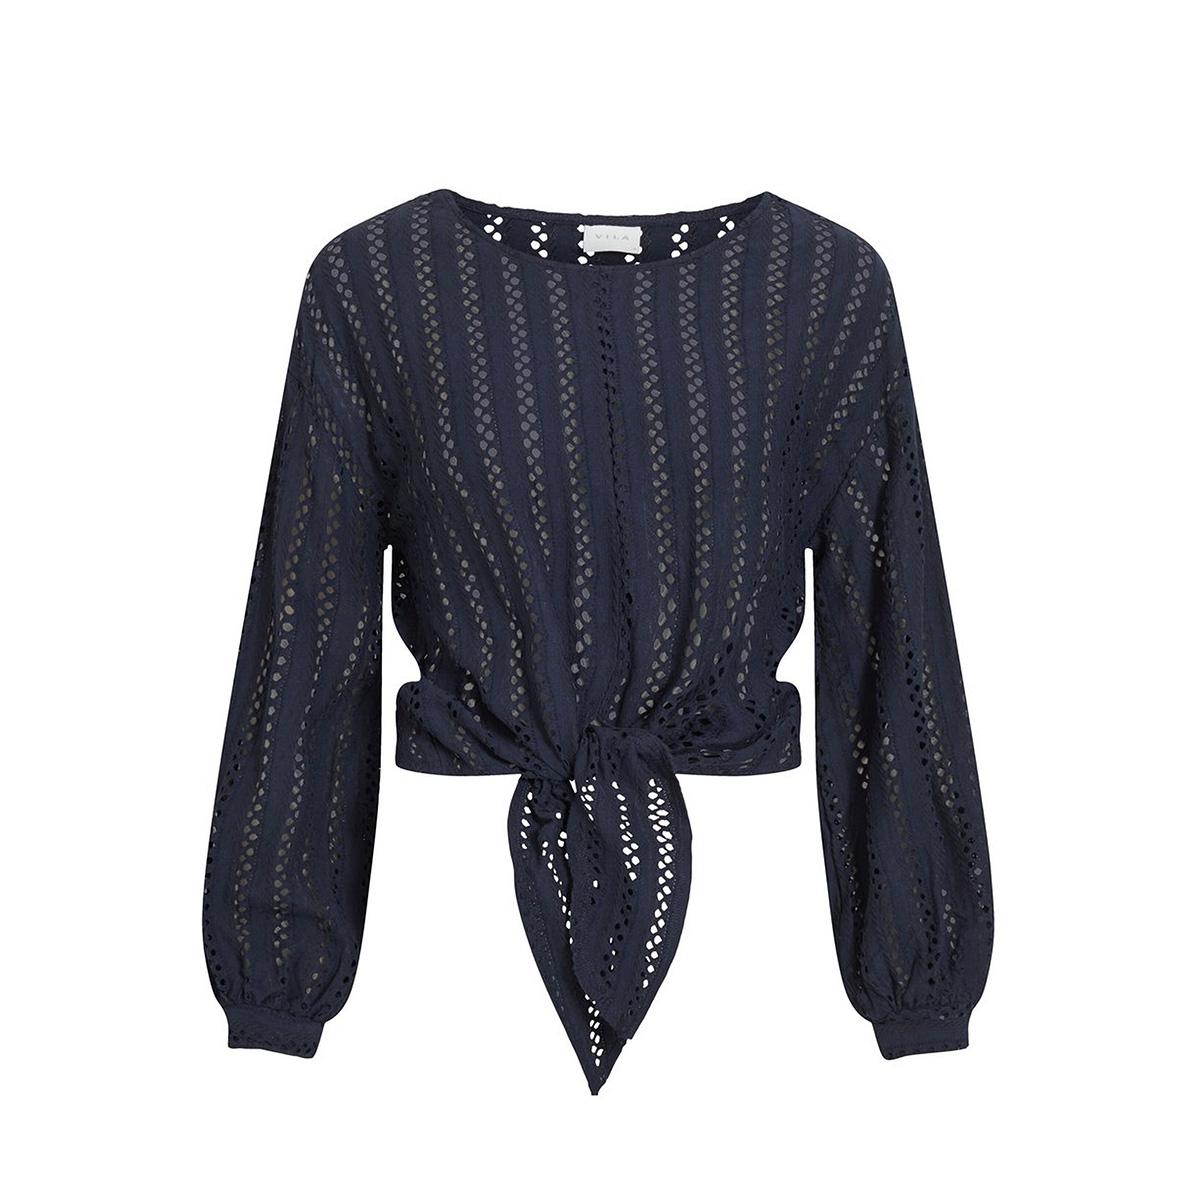 vipiline l/s t-shirt/3 14058309 vila t-shirt navy blazer